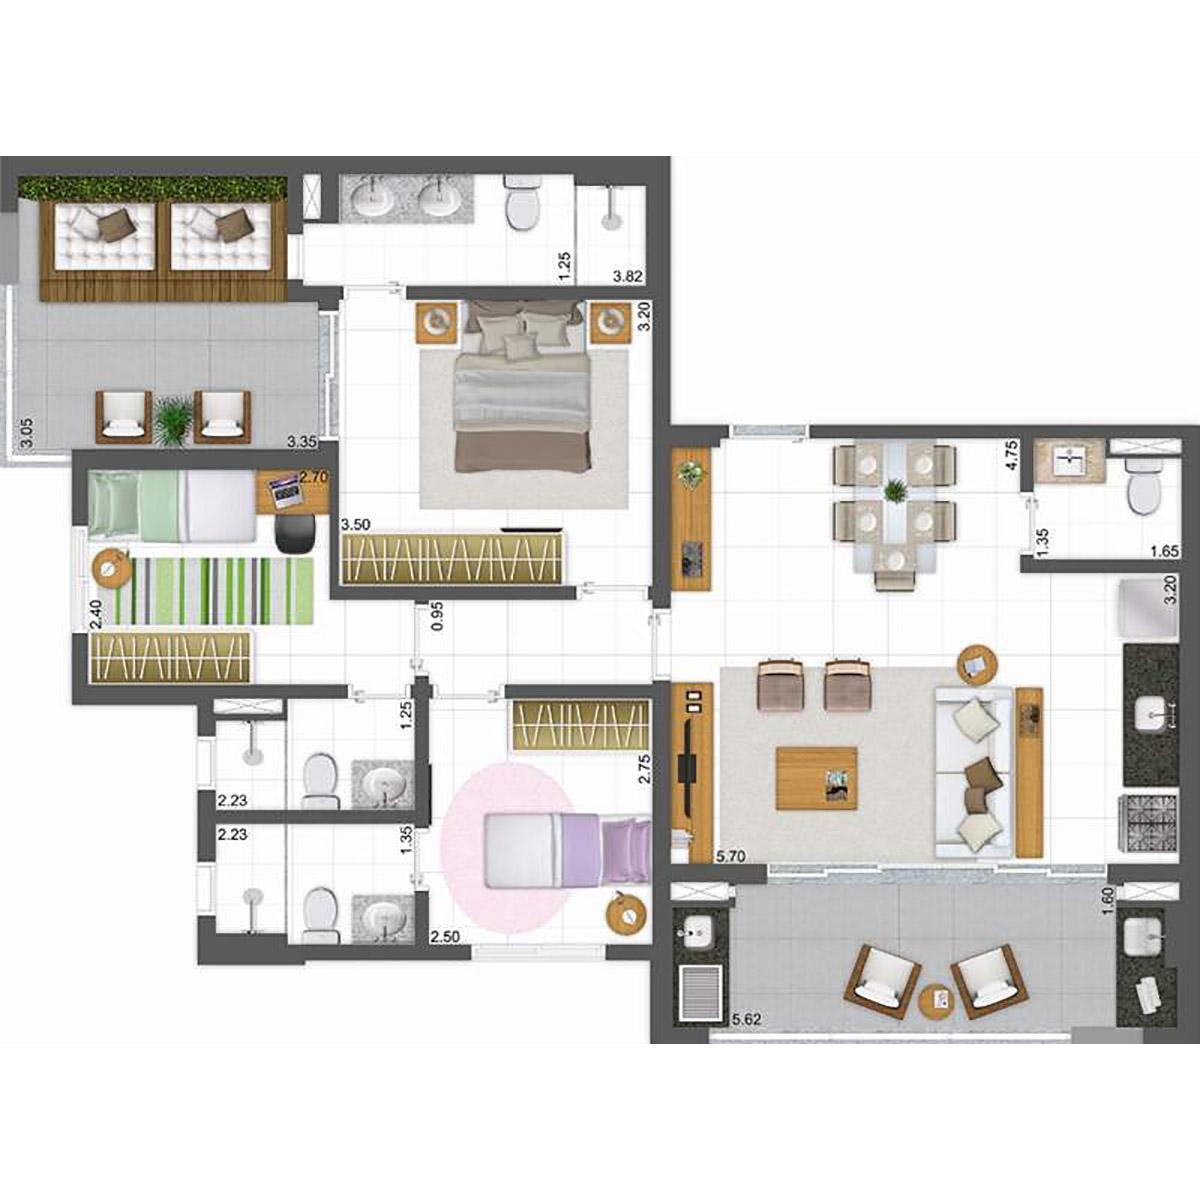 57 m² - Living Ampliado Parkway Panamby